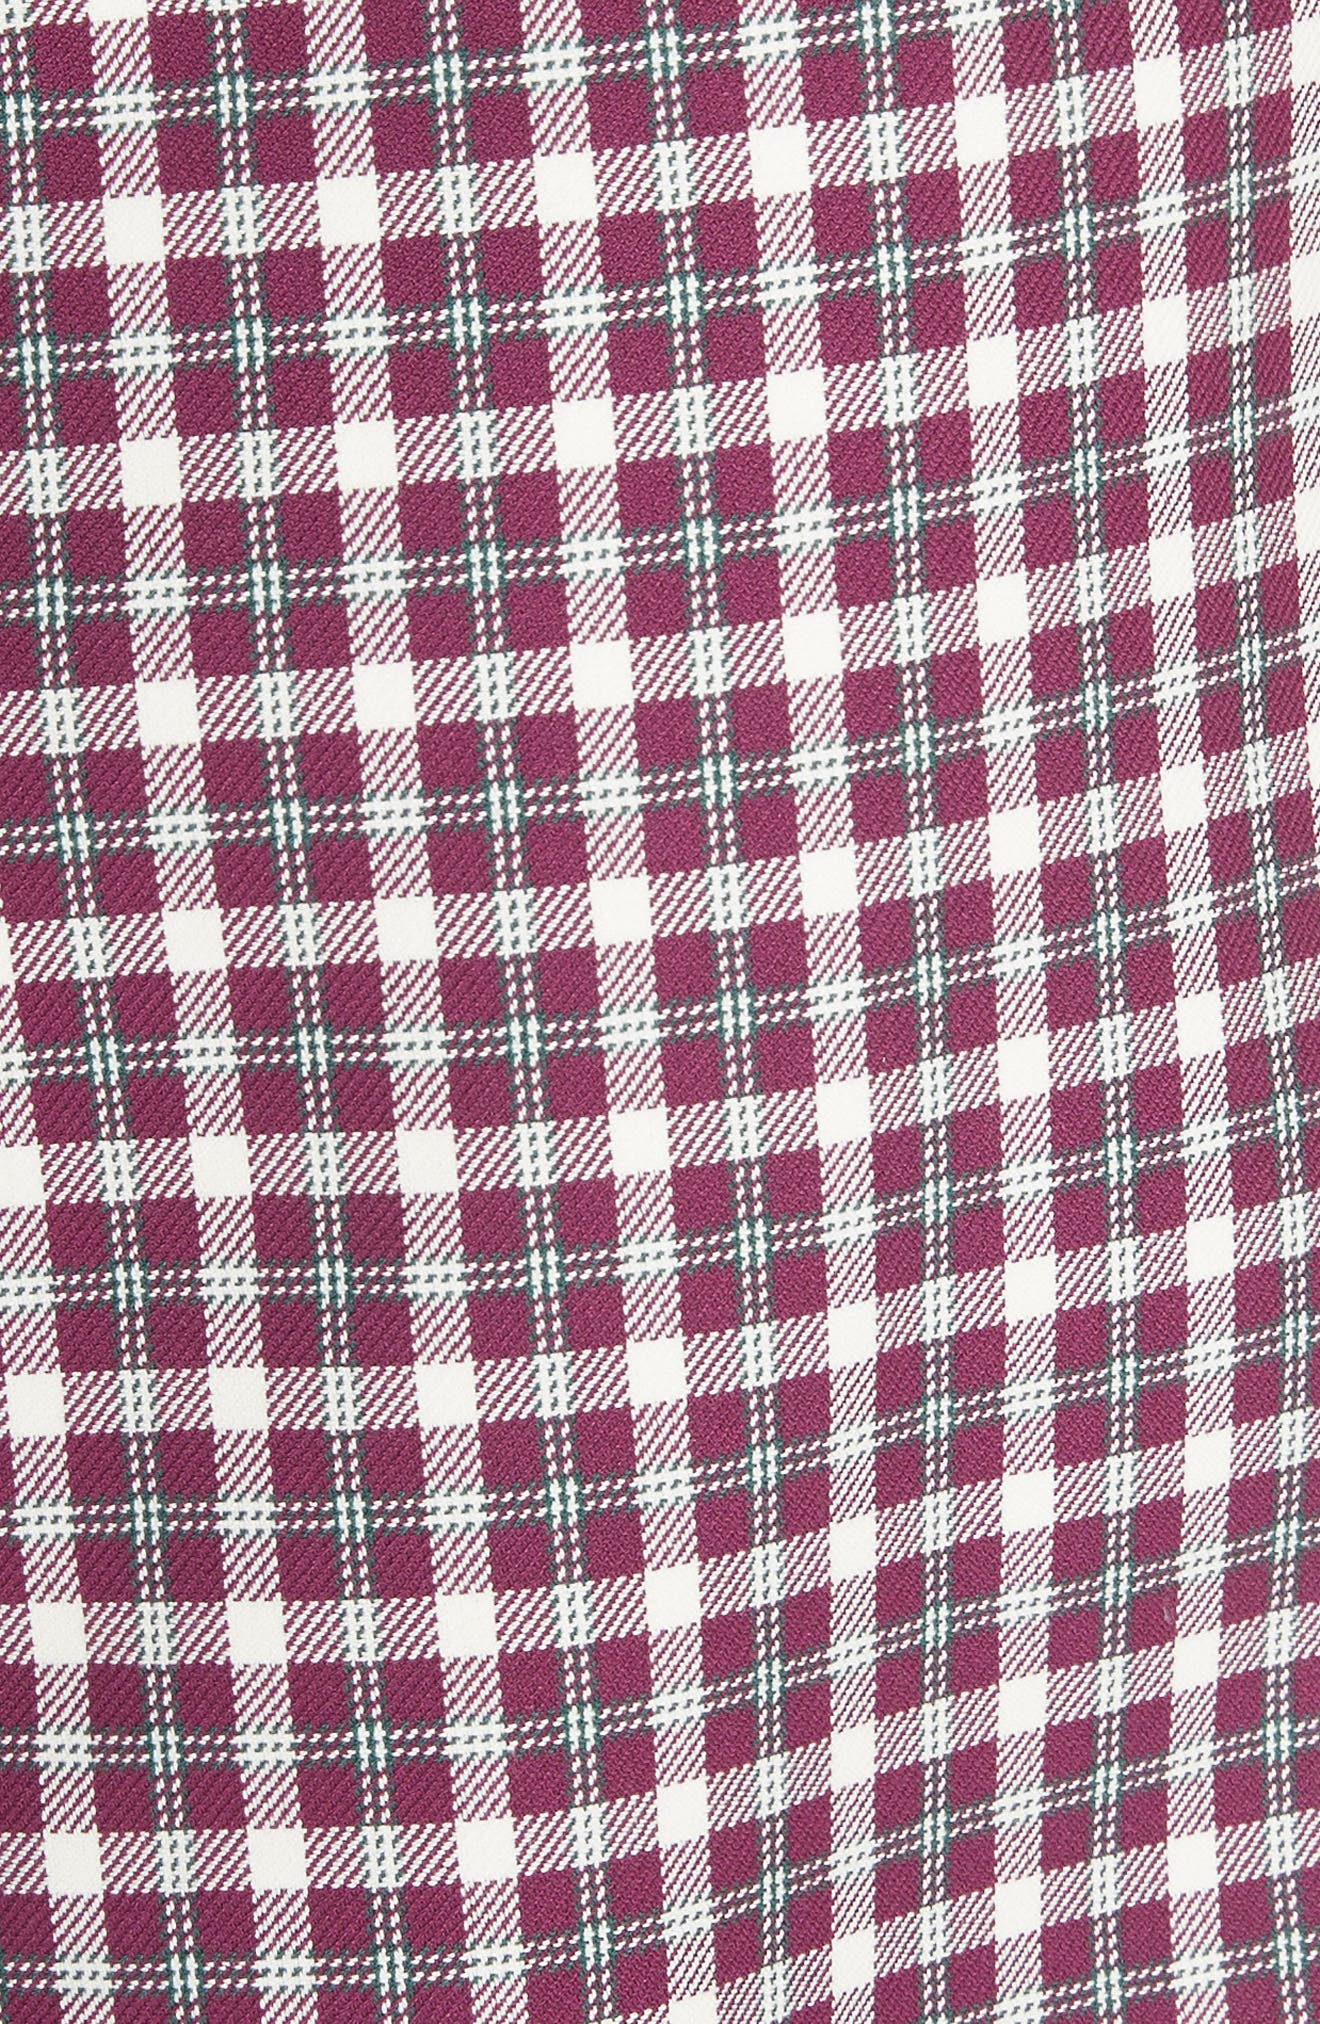 Stanforth Plaid A-Line Skirt,                             Alternate thumbnail 5, color,                             BURGUNDY